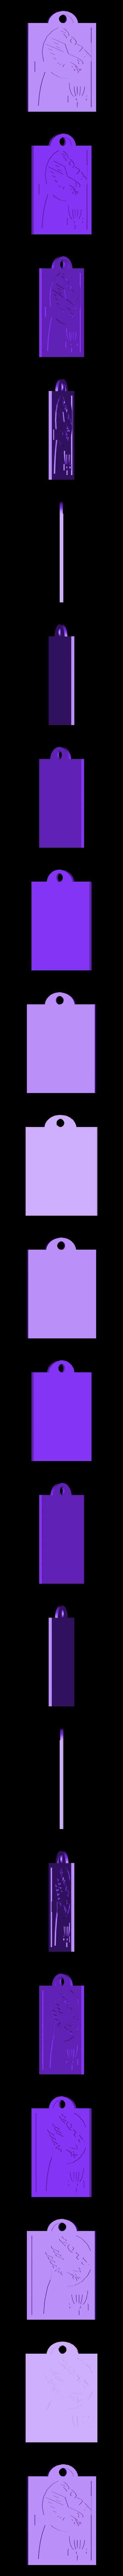 Disc_Bag_Tag_7.stl Download free STL file Disc Golf Bag Tag • 3D print design, mrhers2